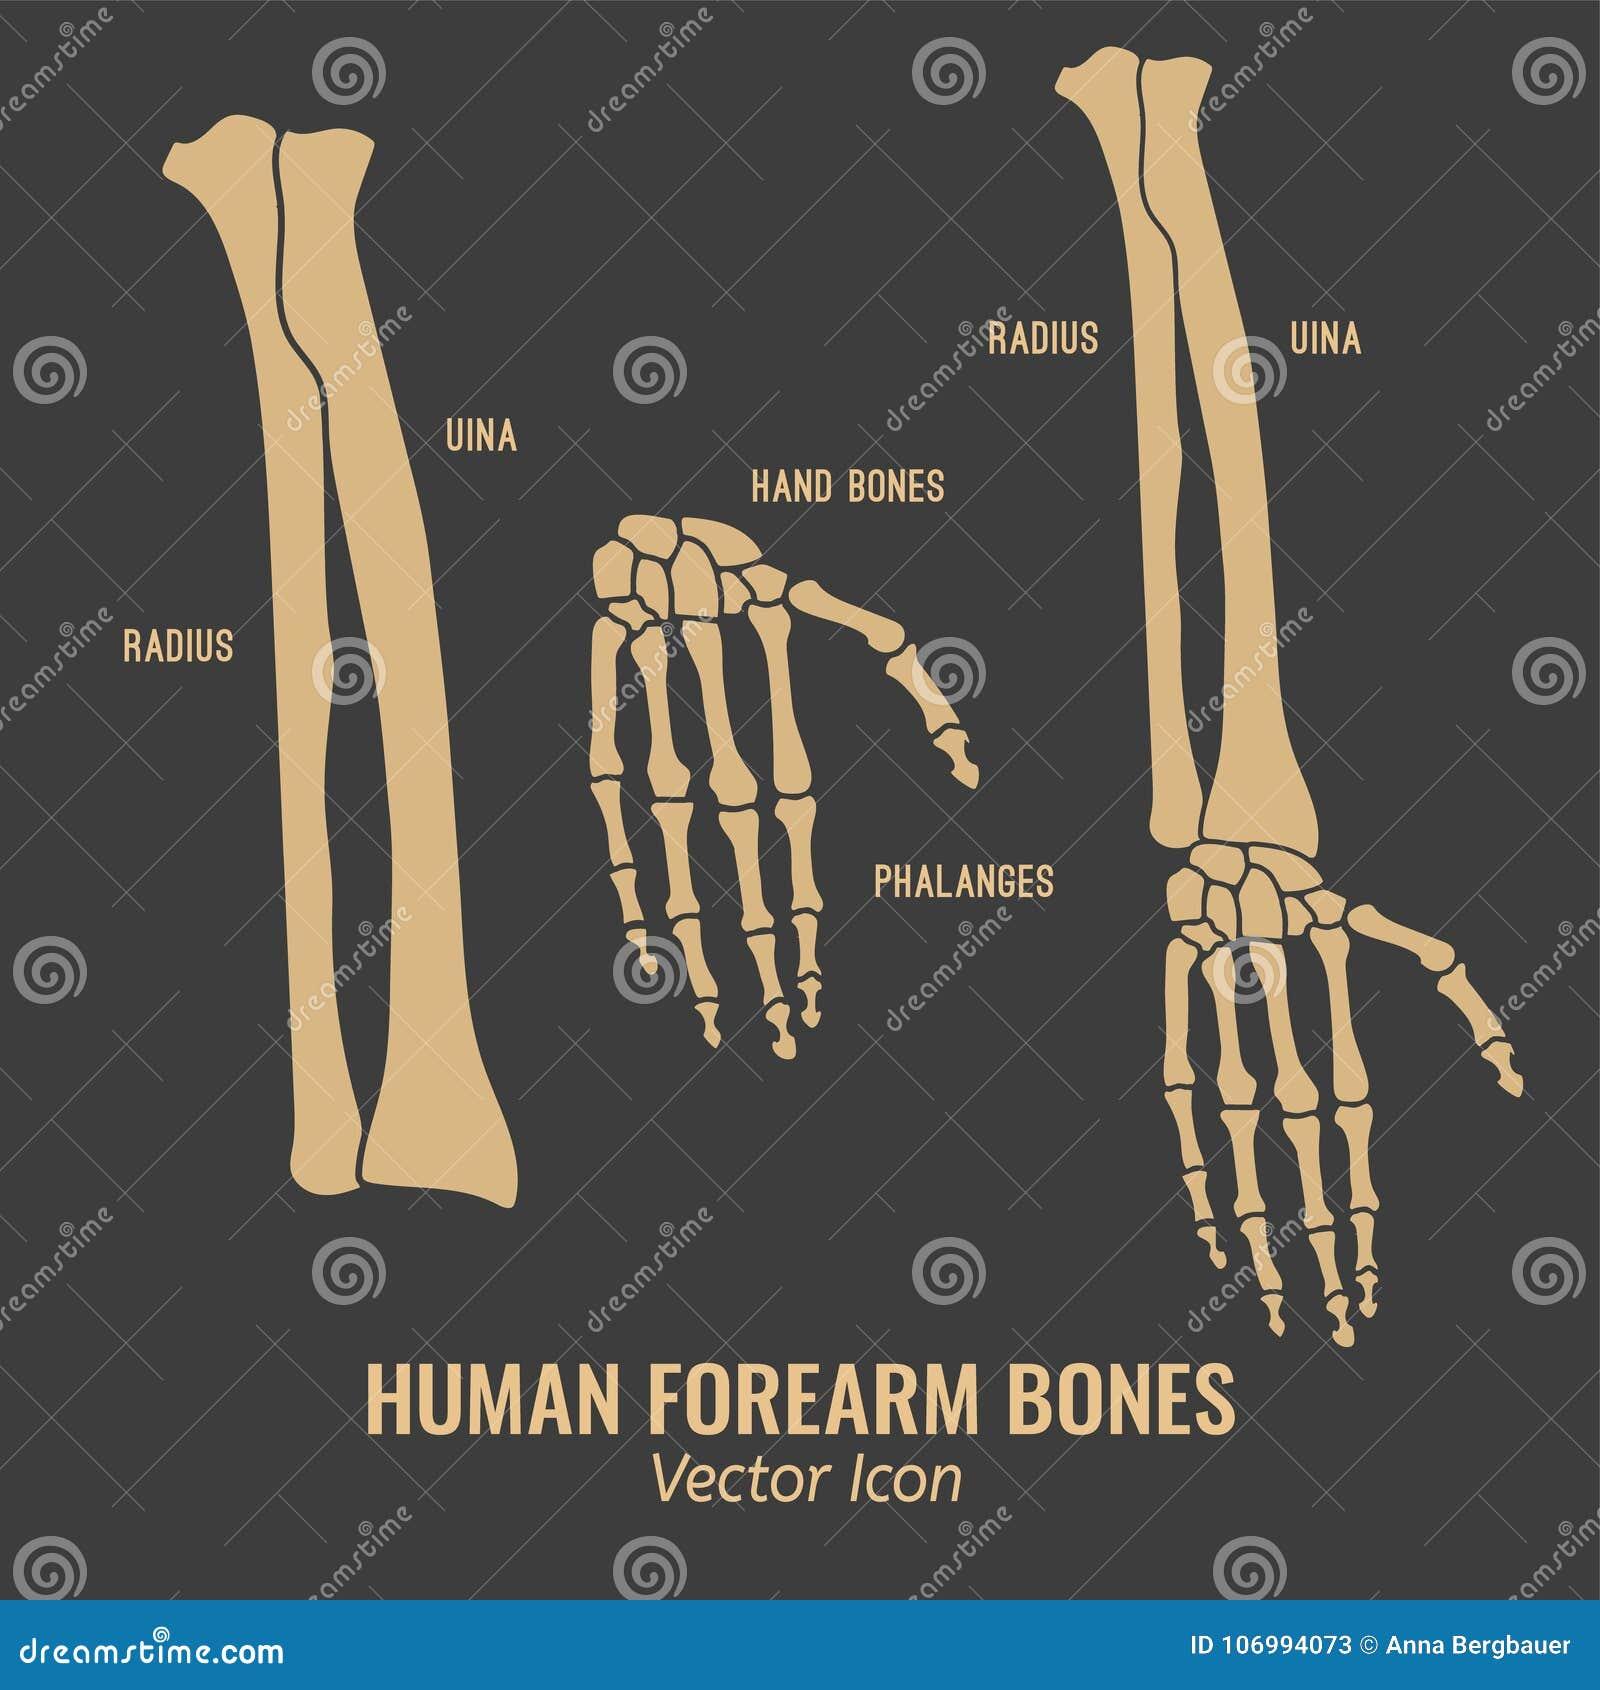 Human Forearm Bones Icons Stock Vector Illustration Of Healthcare